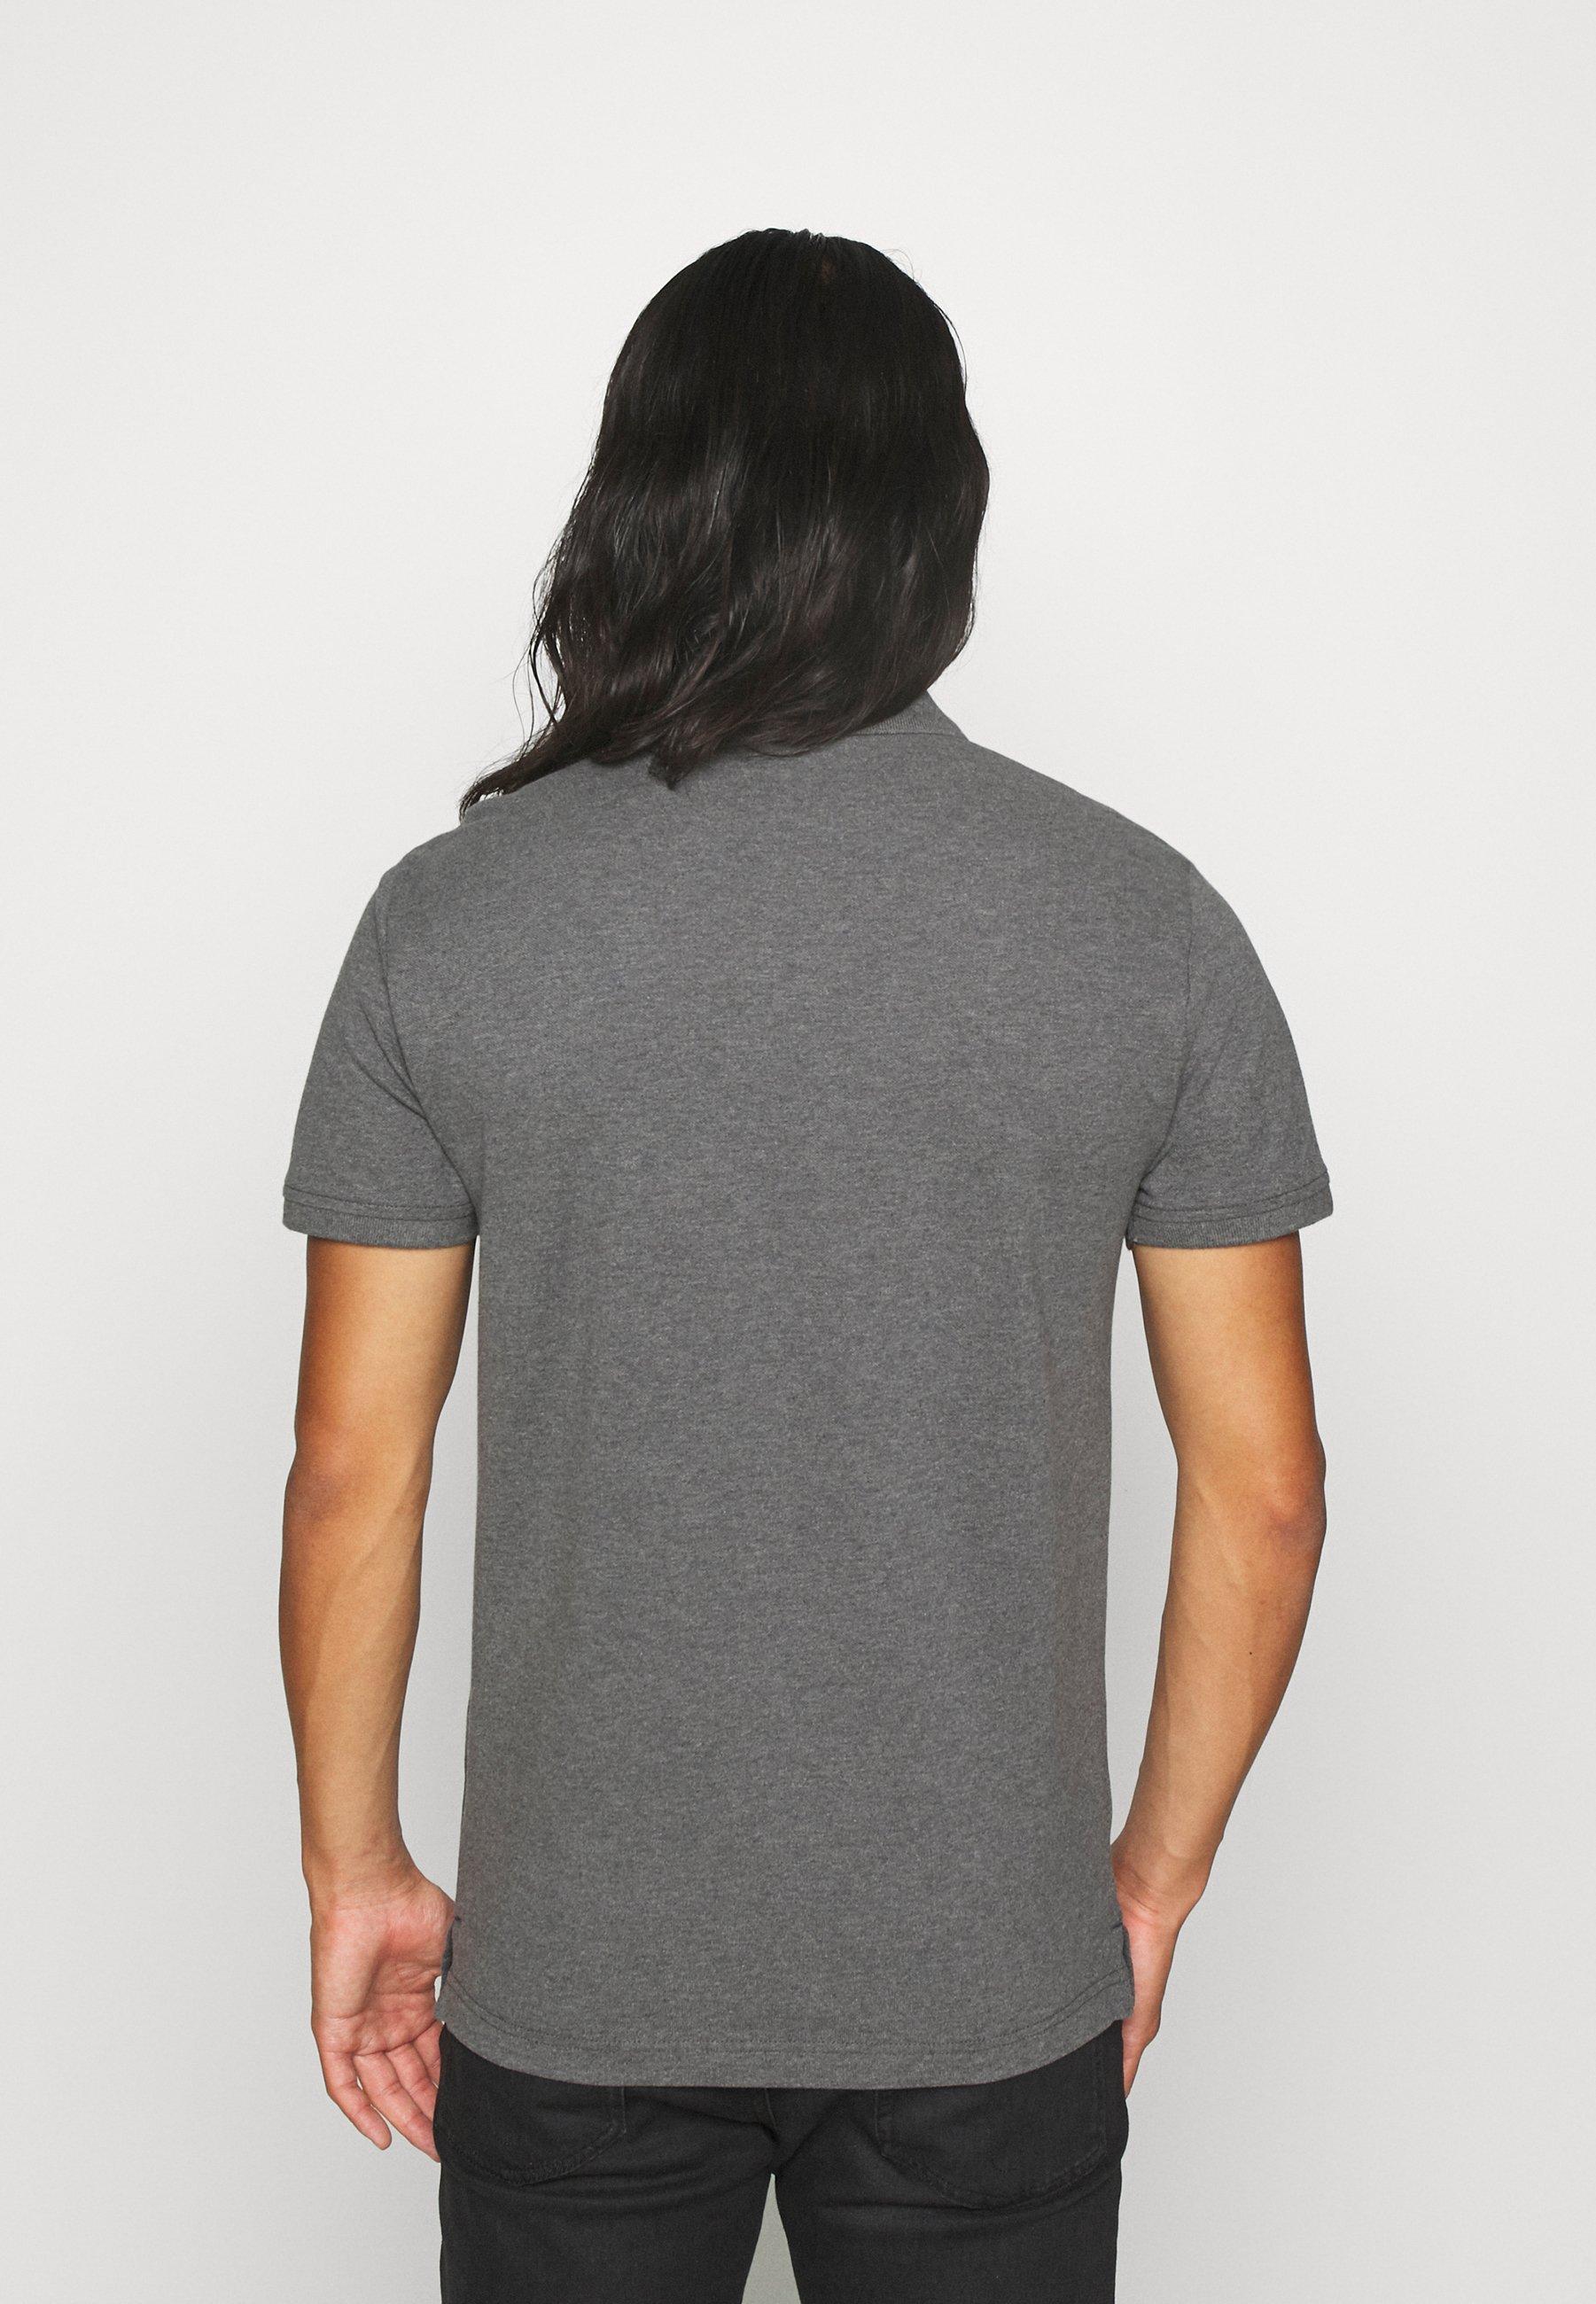 IZOD Polo shirt - carbon FbOzV